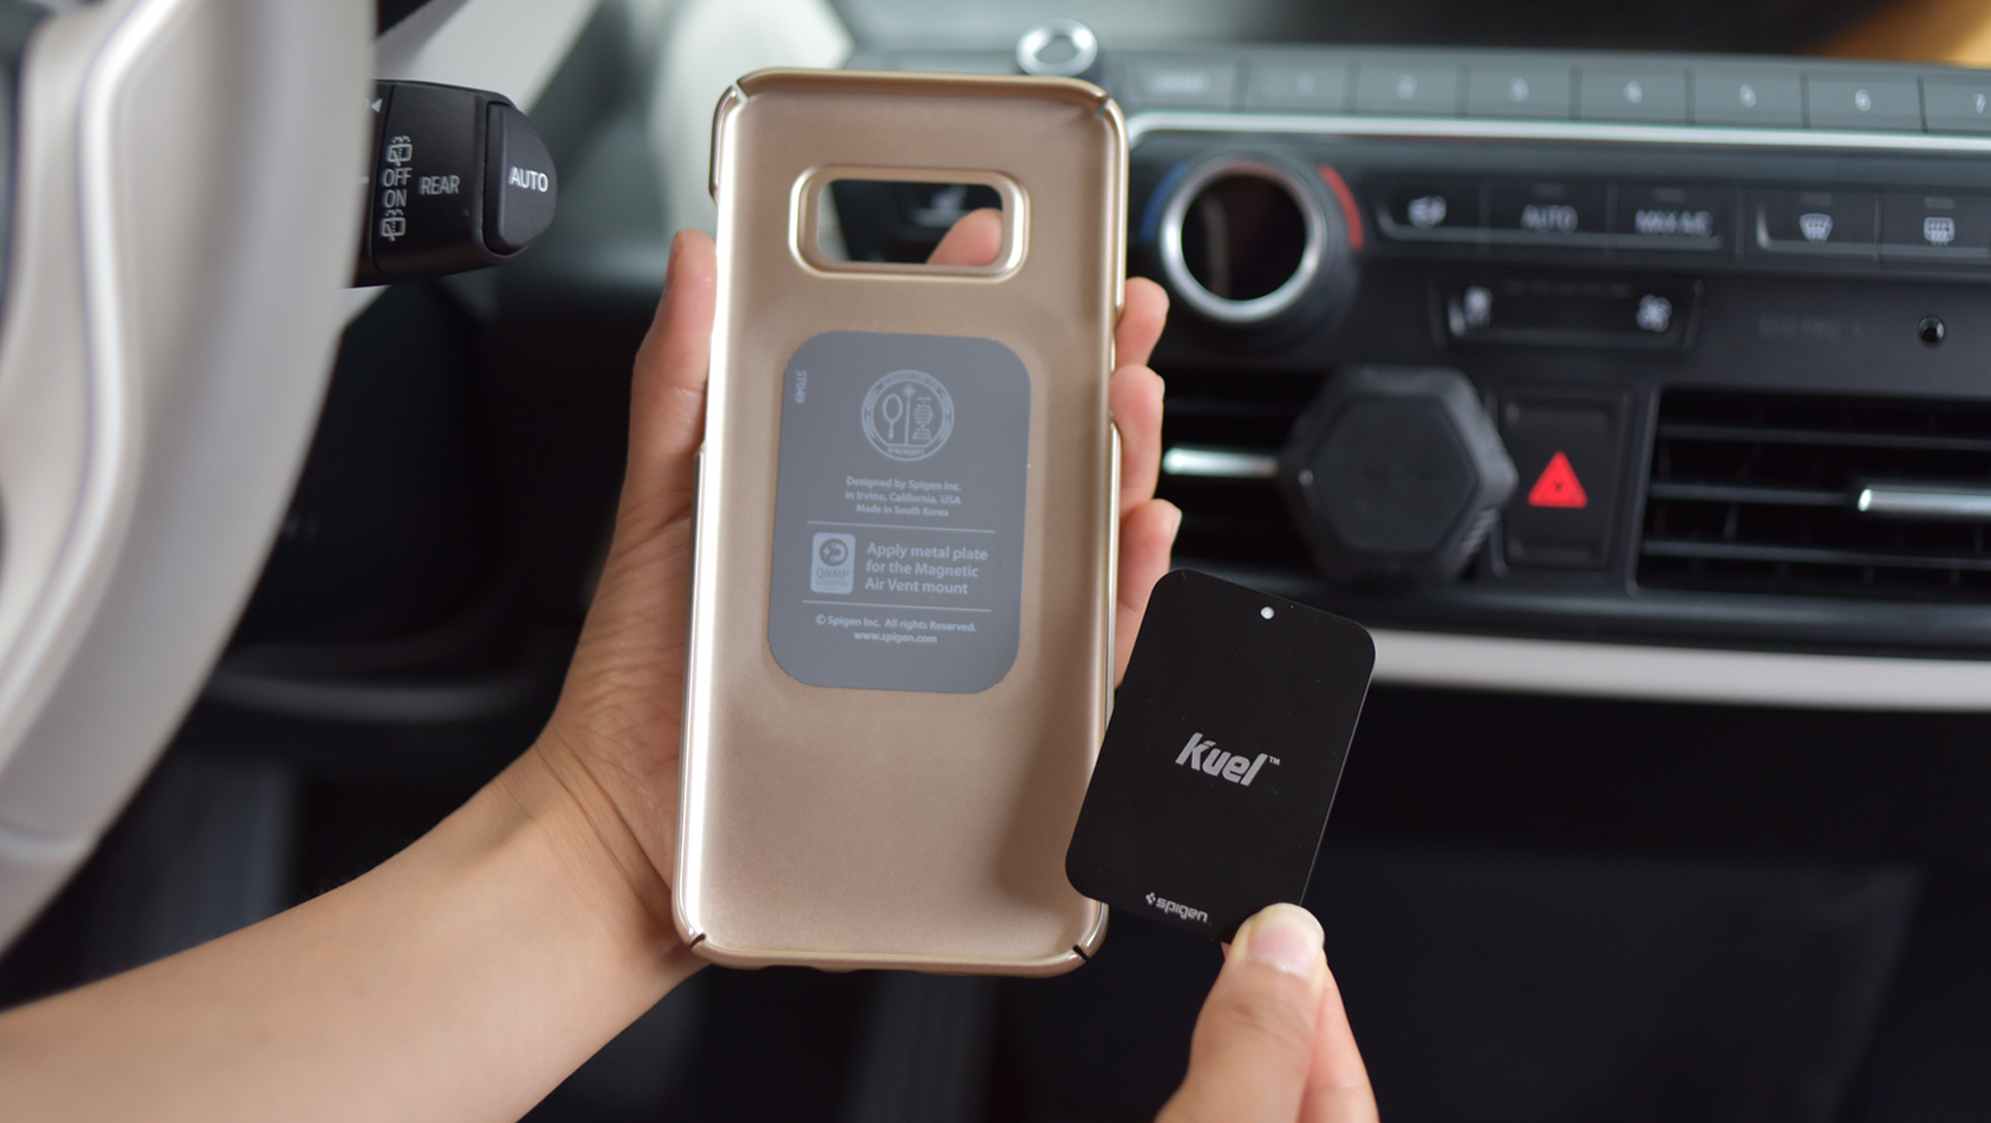 newest b04c1 f2d02 Get Spigen's super slim Kuel QS11 Magnetic Car iPhone Mount for ...